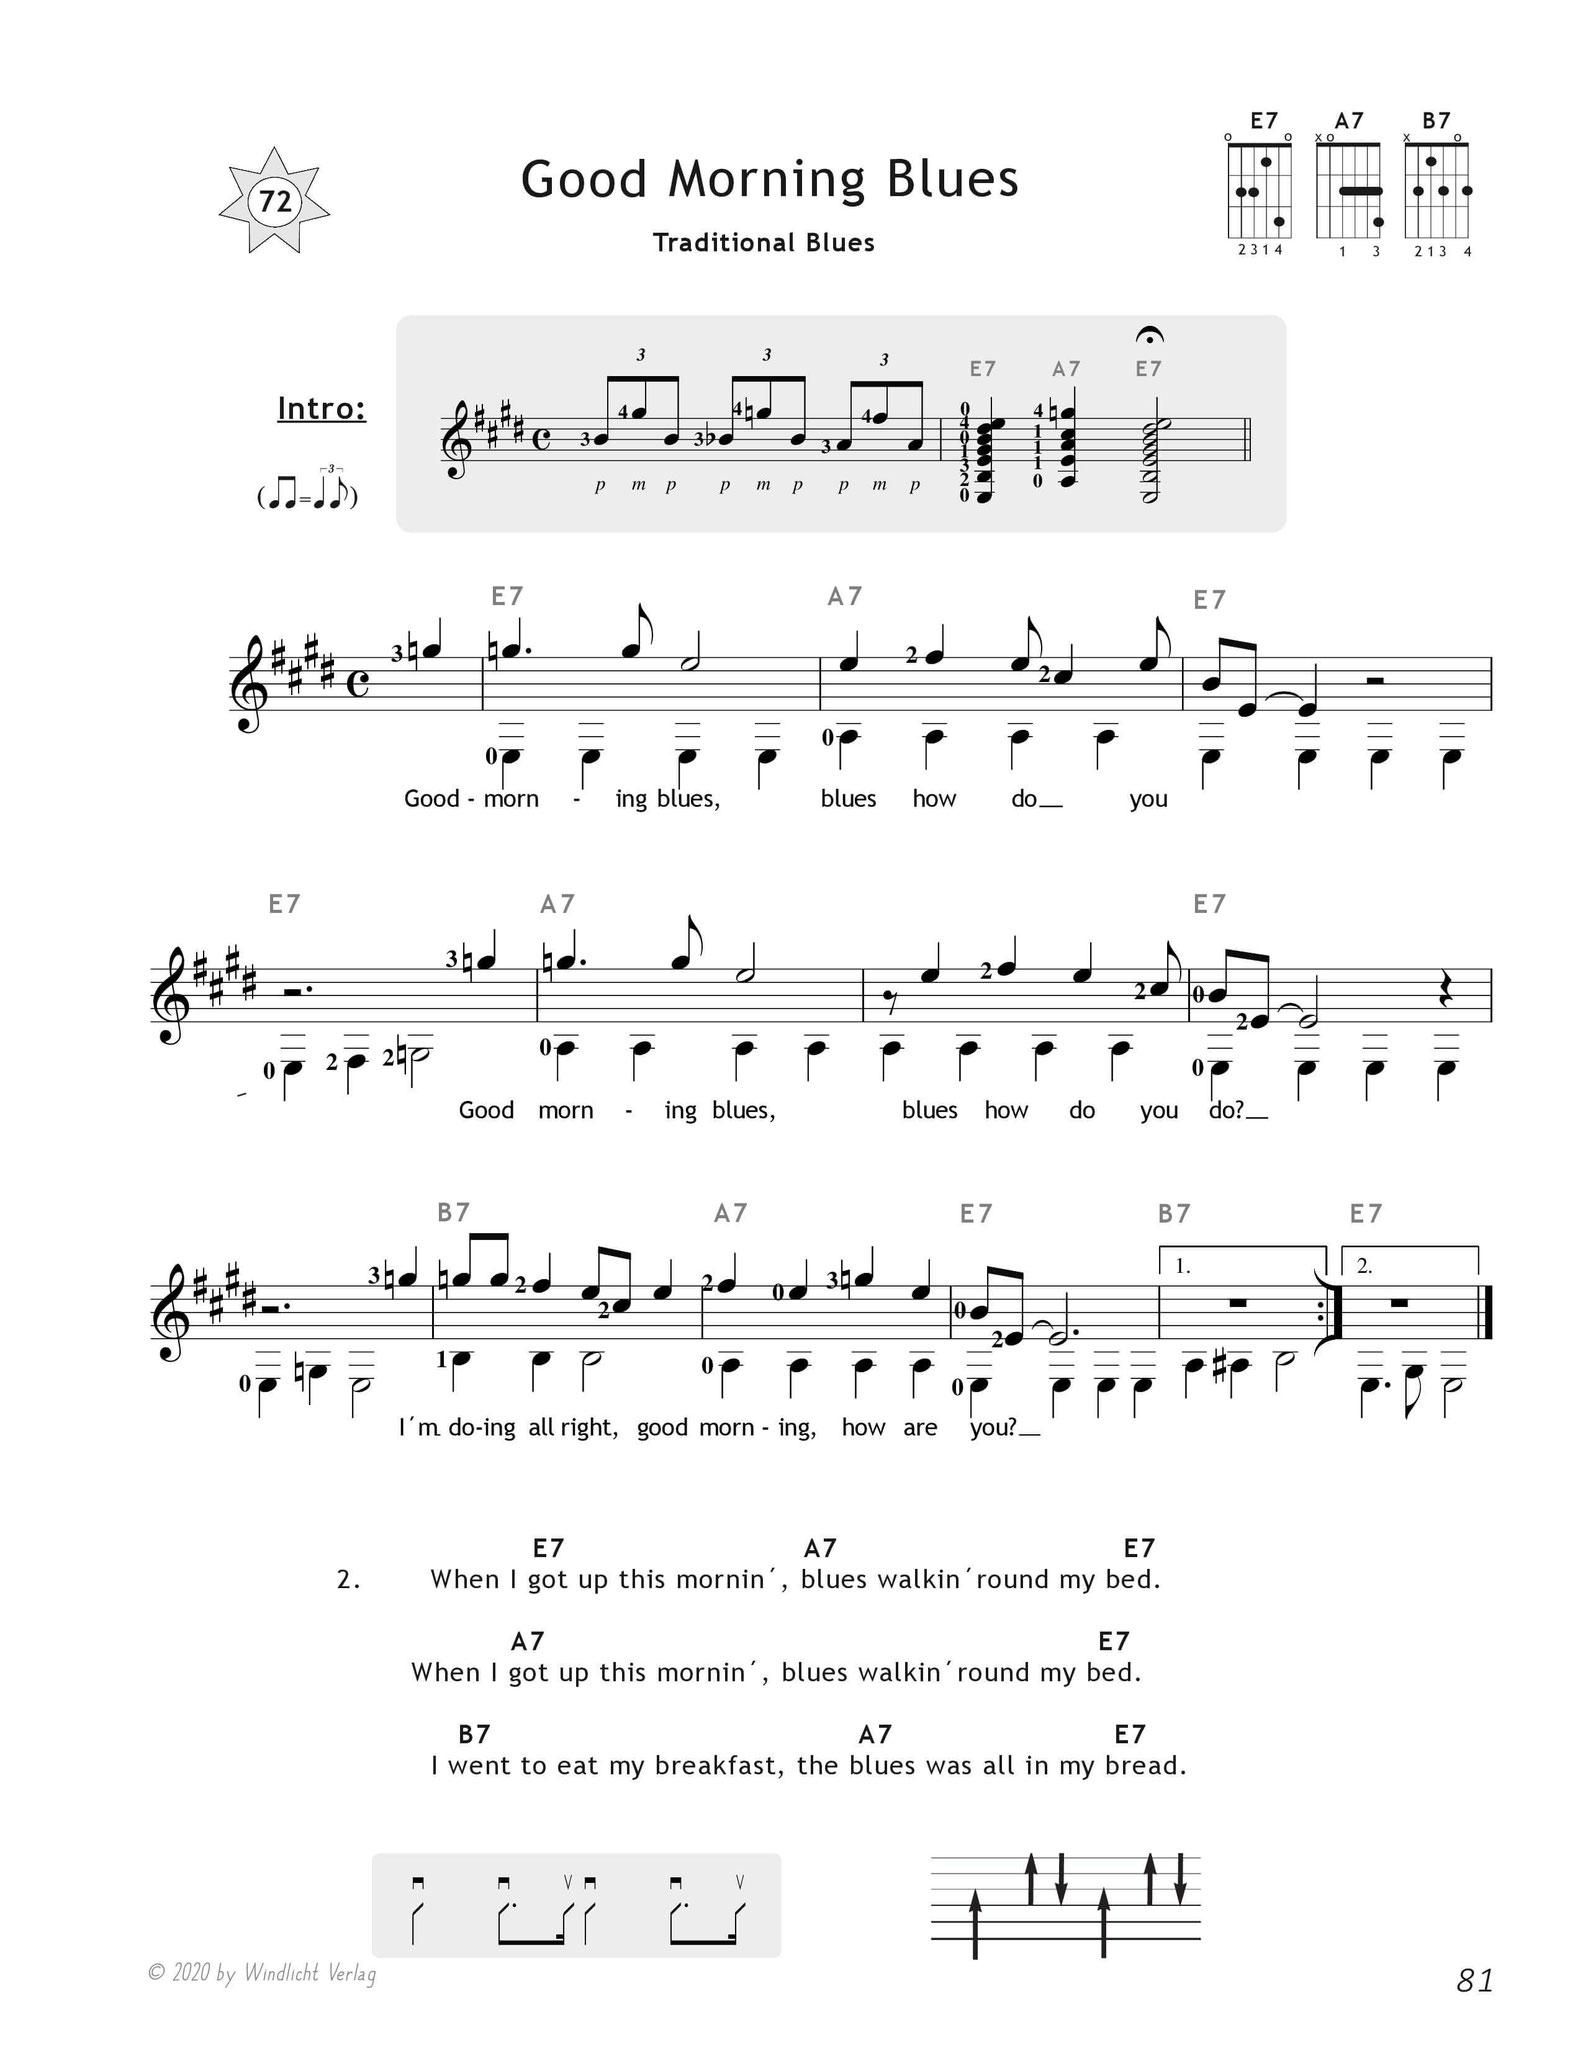 merlins-guitar-lessons-